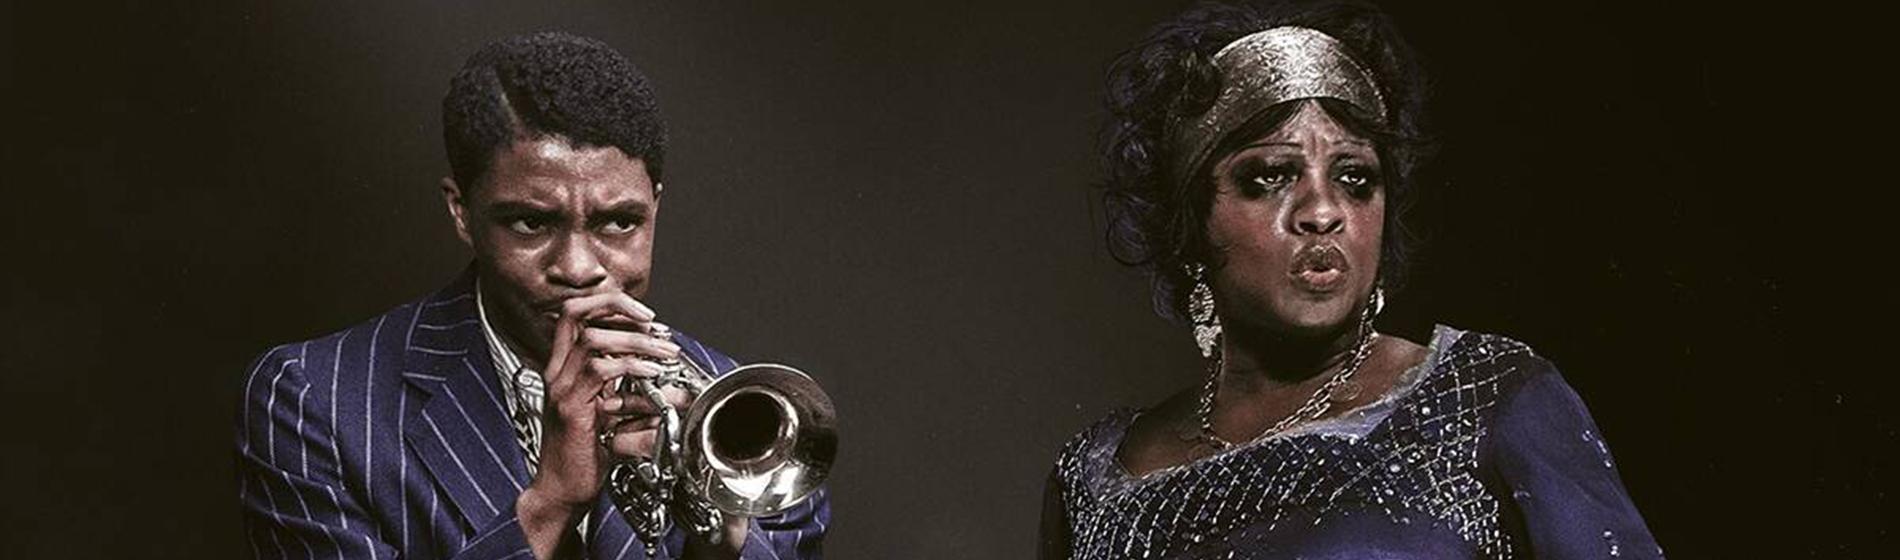 Chadwick Boseman, Viola Davis in Ma Rainey's Black Bottom